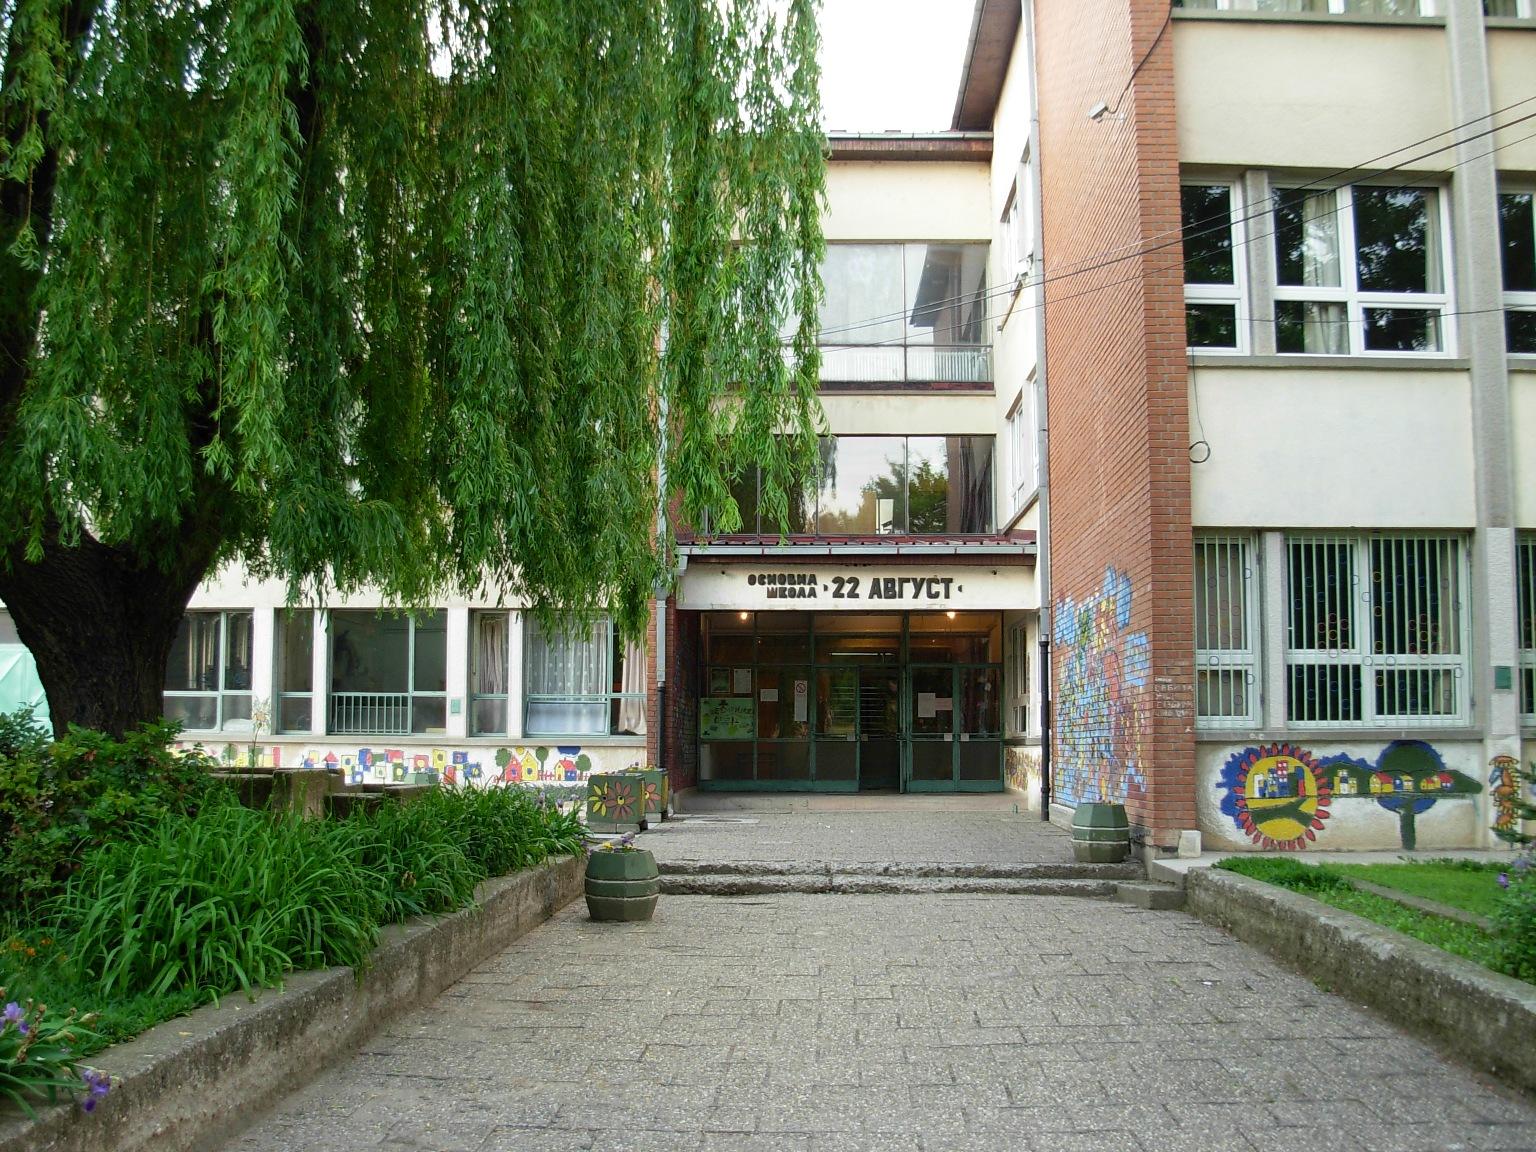 osnovna skola 22 avgust bukovac slika skole